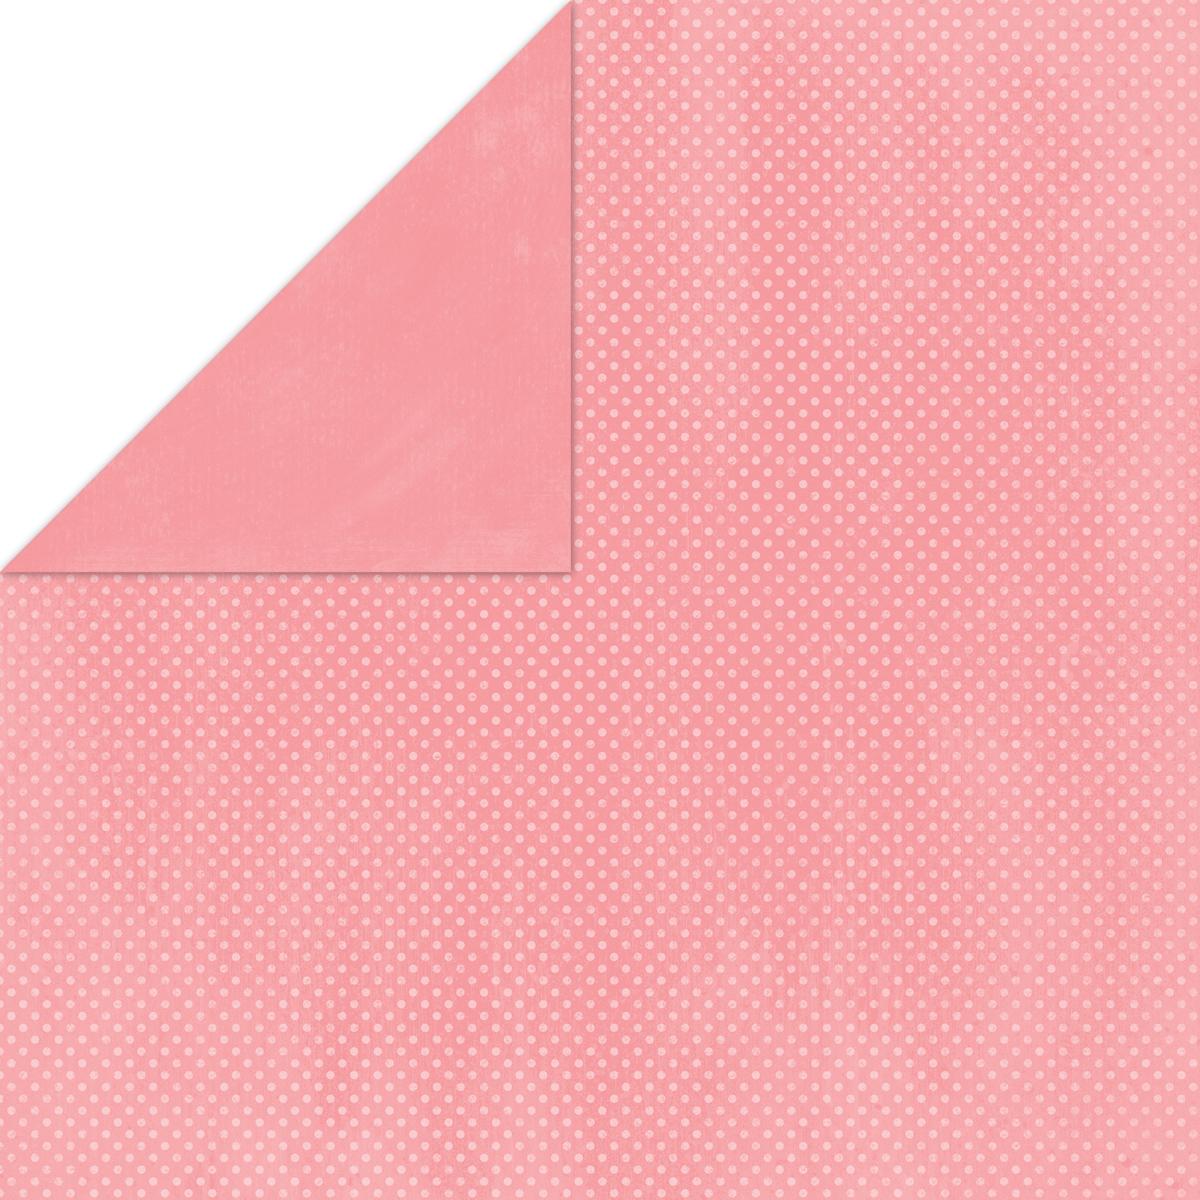 BoBunny Double Dot Double-Sided Textured Cardstock 12X12-Flamingo